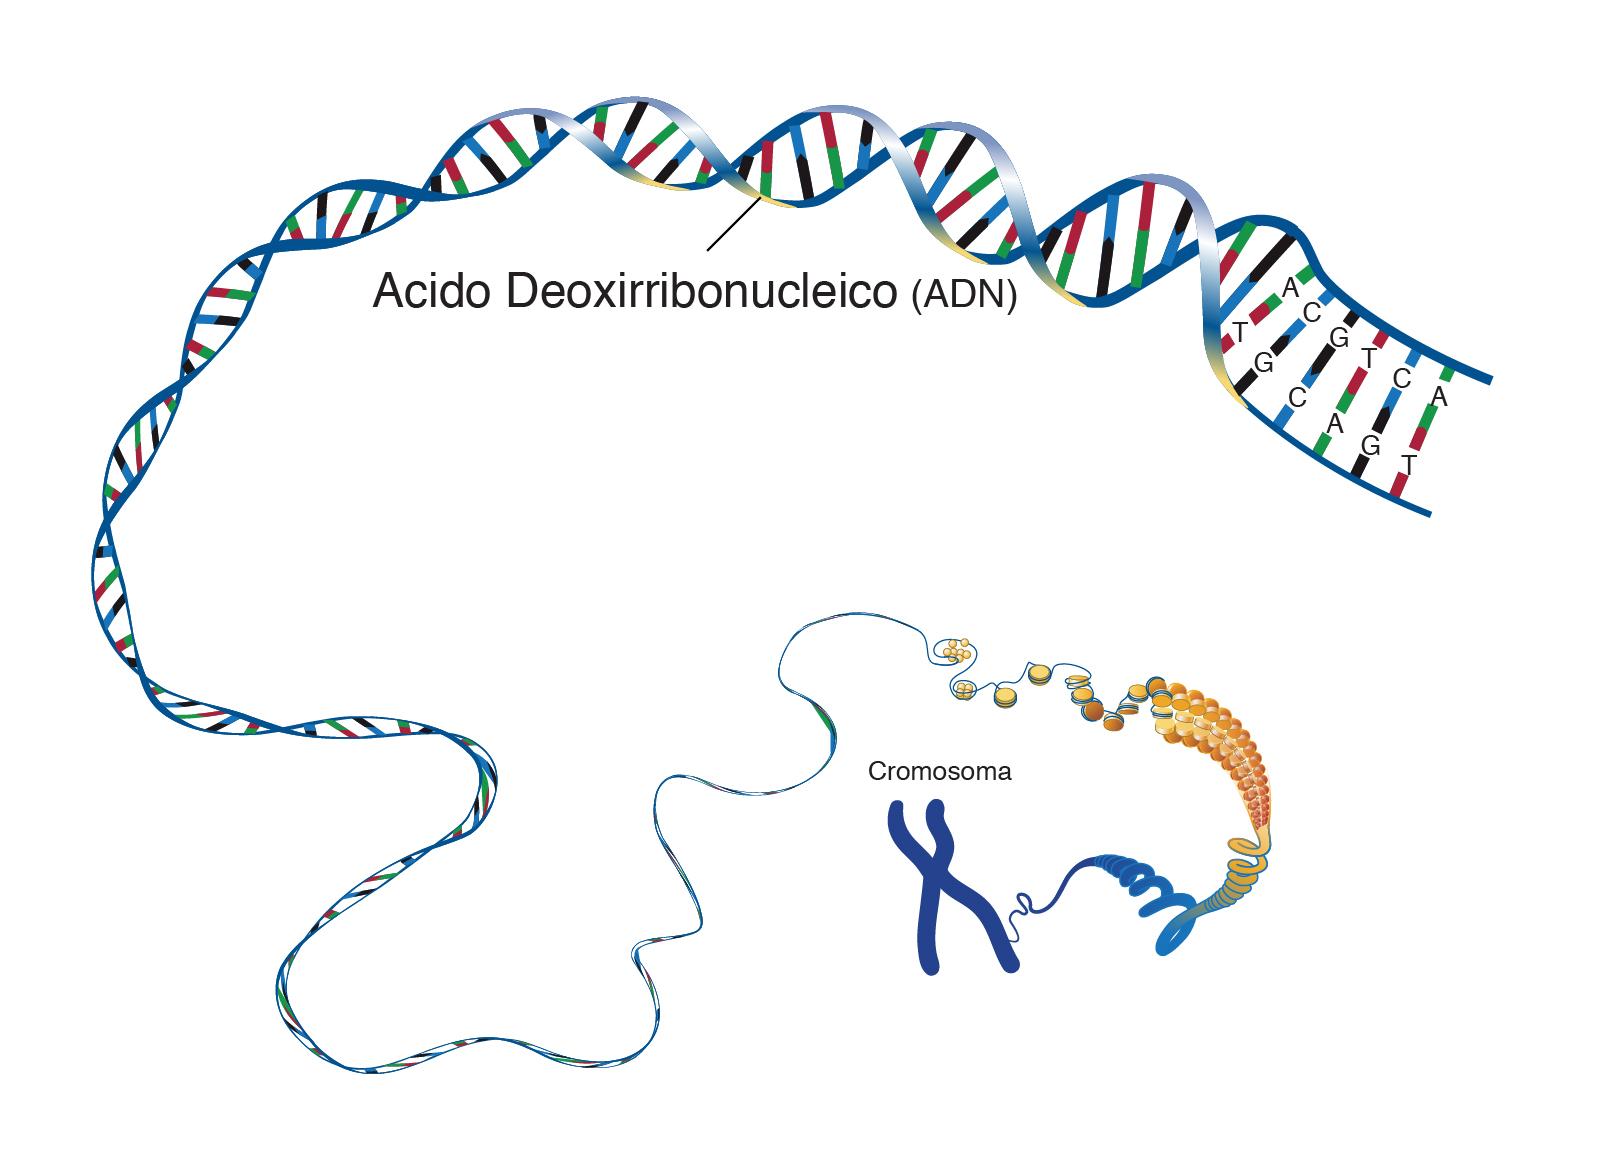 Adn ácido Desoxirribonucleico Nhgri